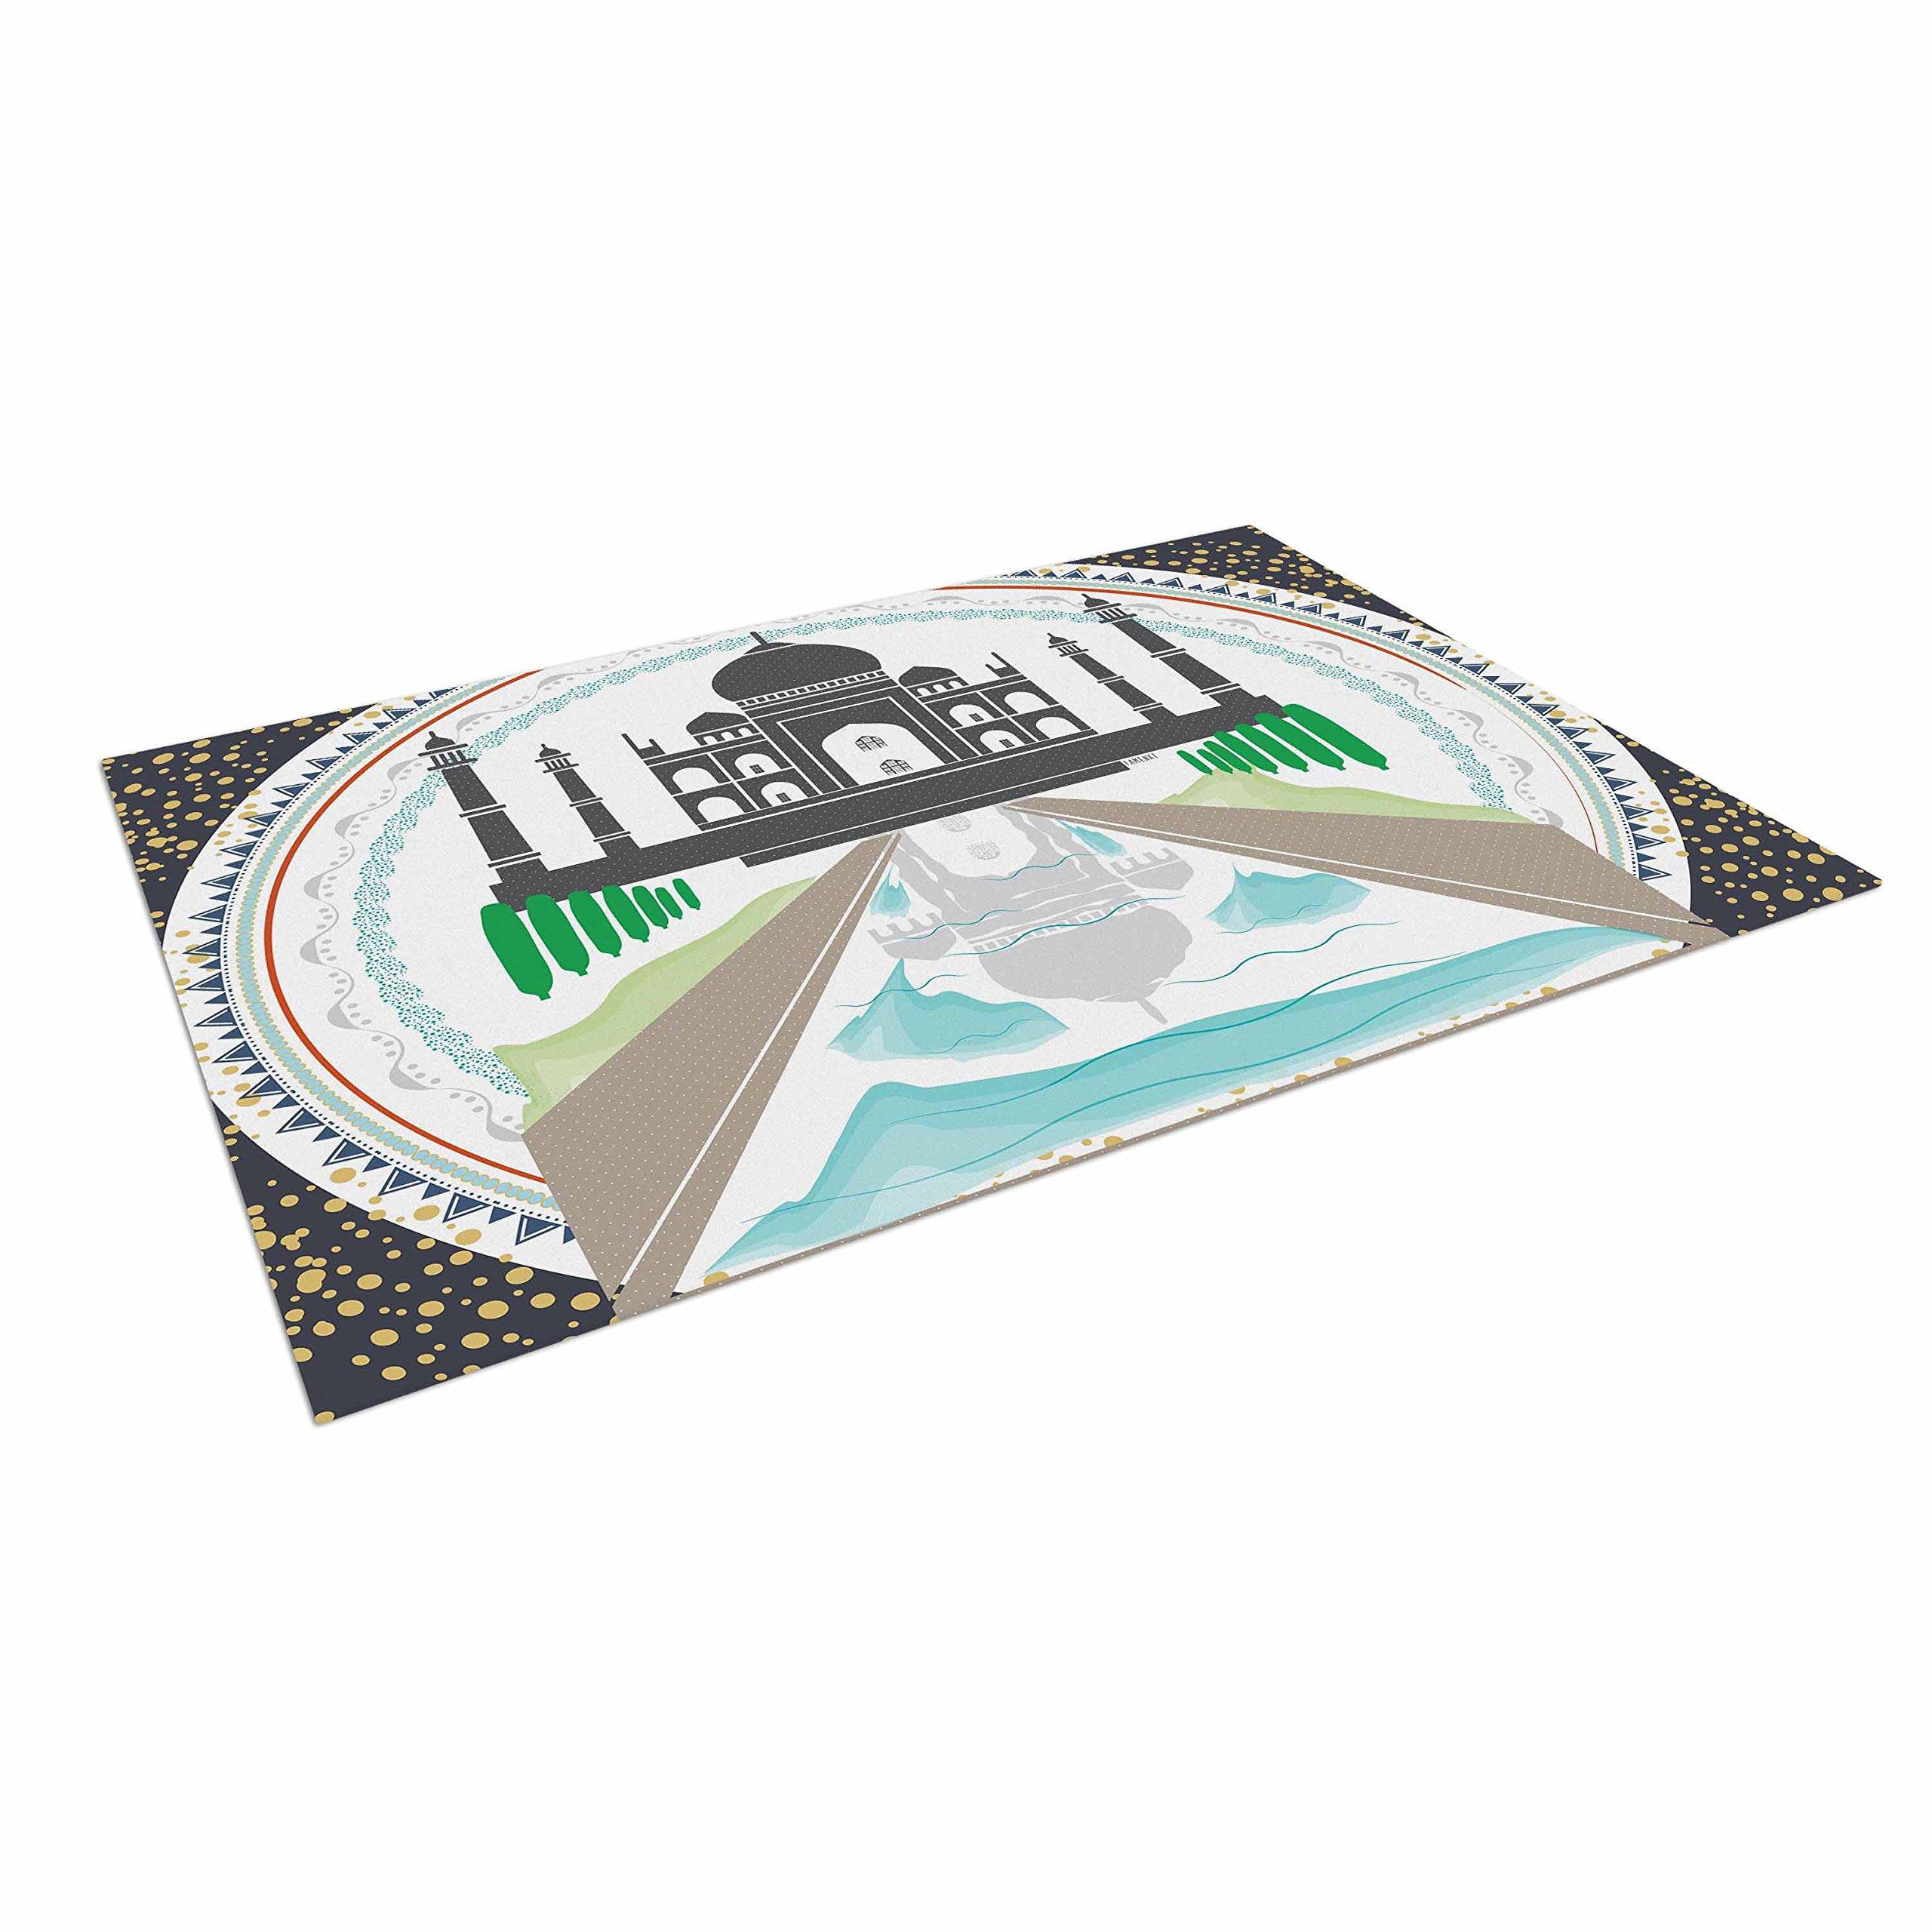 KESS InHouse Famenxt ''The Taj Mahal India'' Green Gray Indoor/Outdoor Floor Mat, 4' x 5' by Kess InHouse (Image #1)